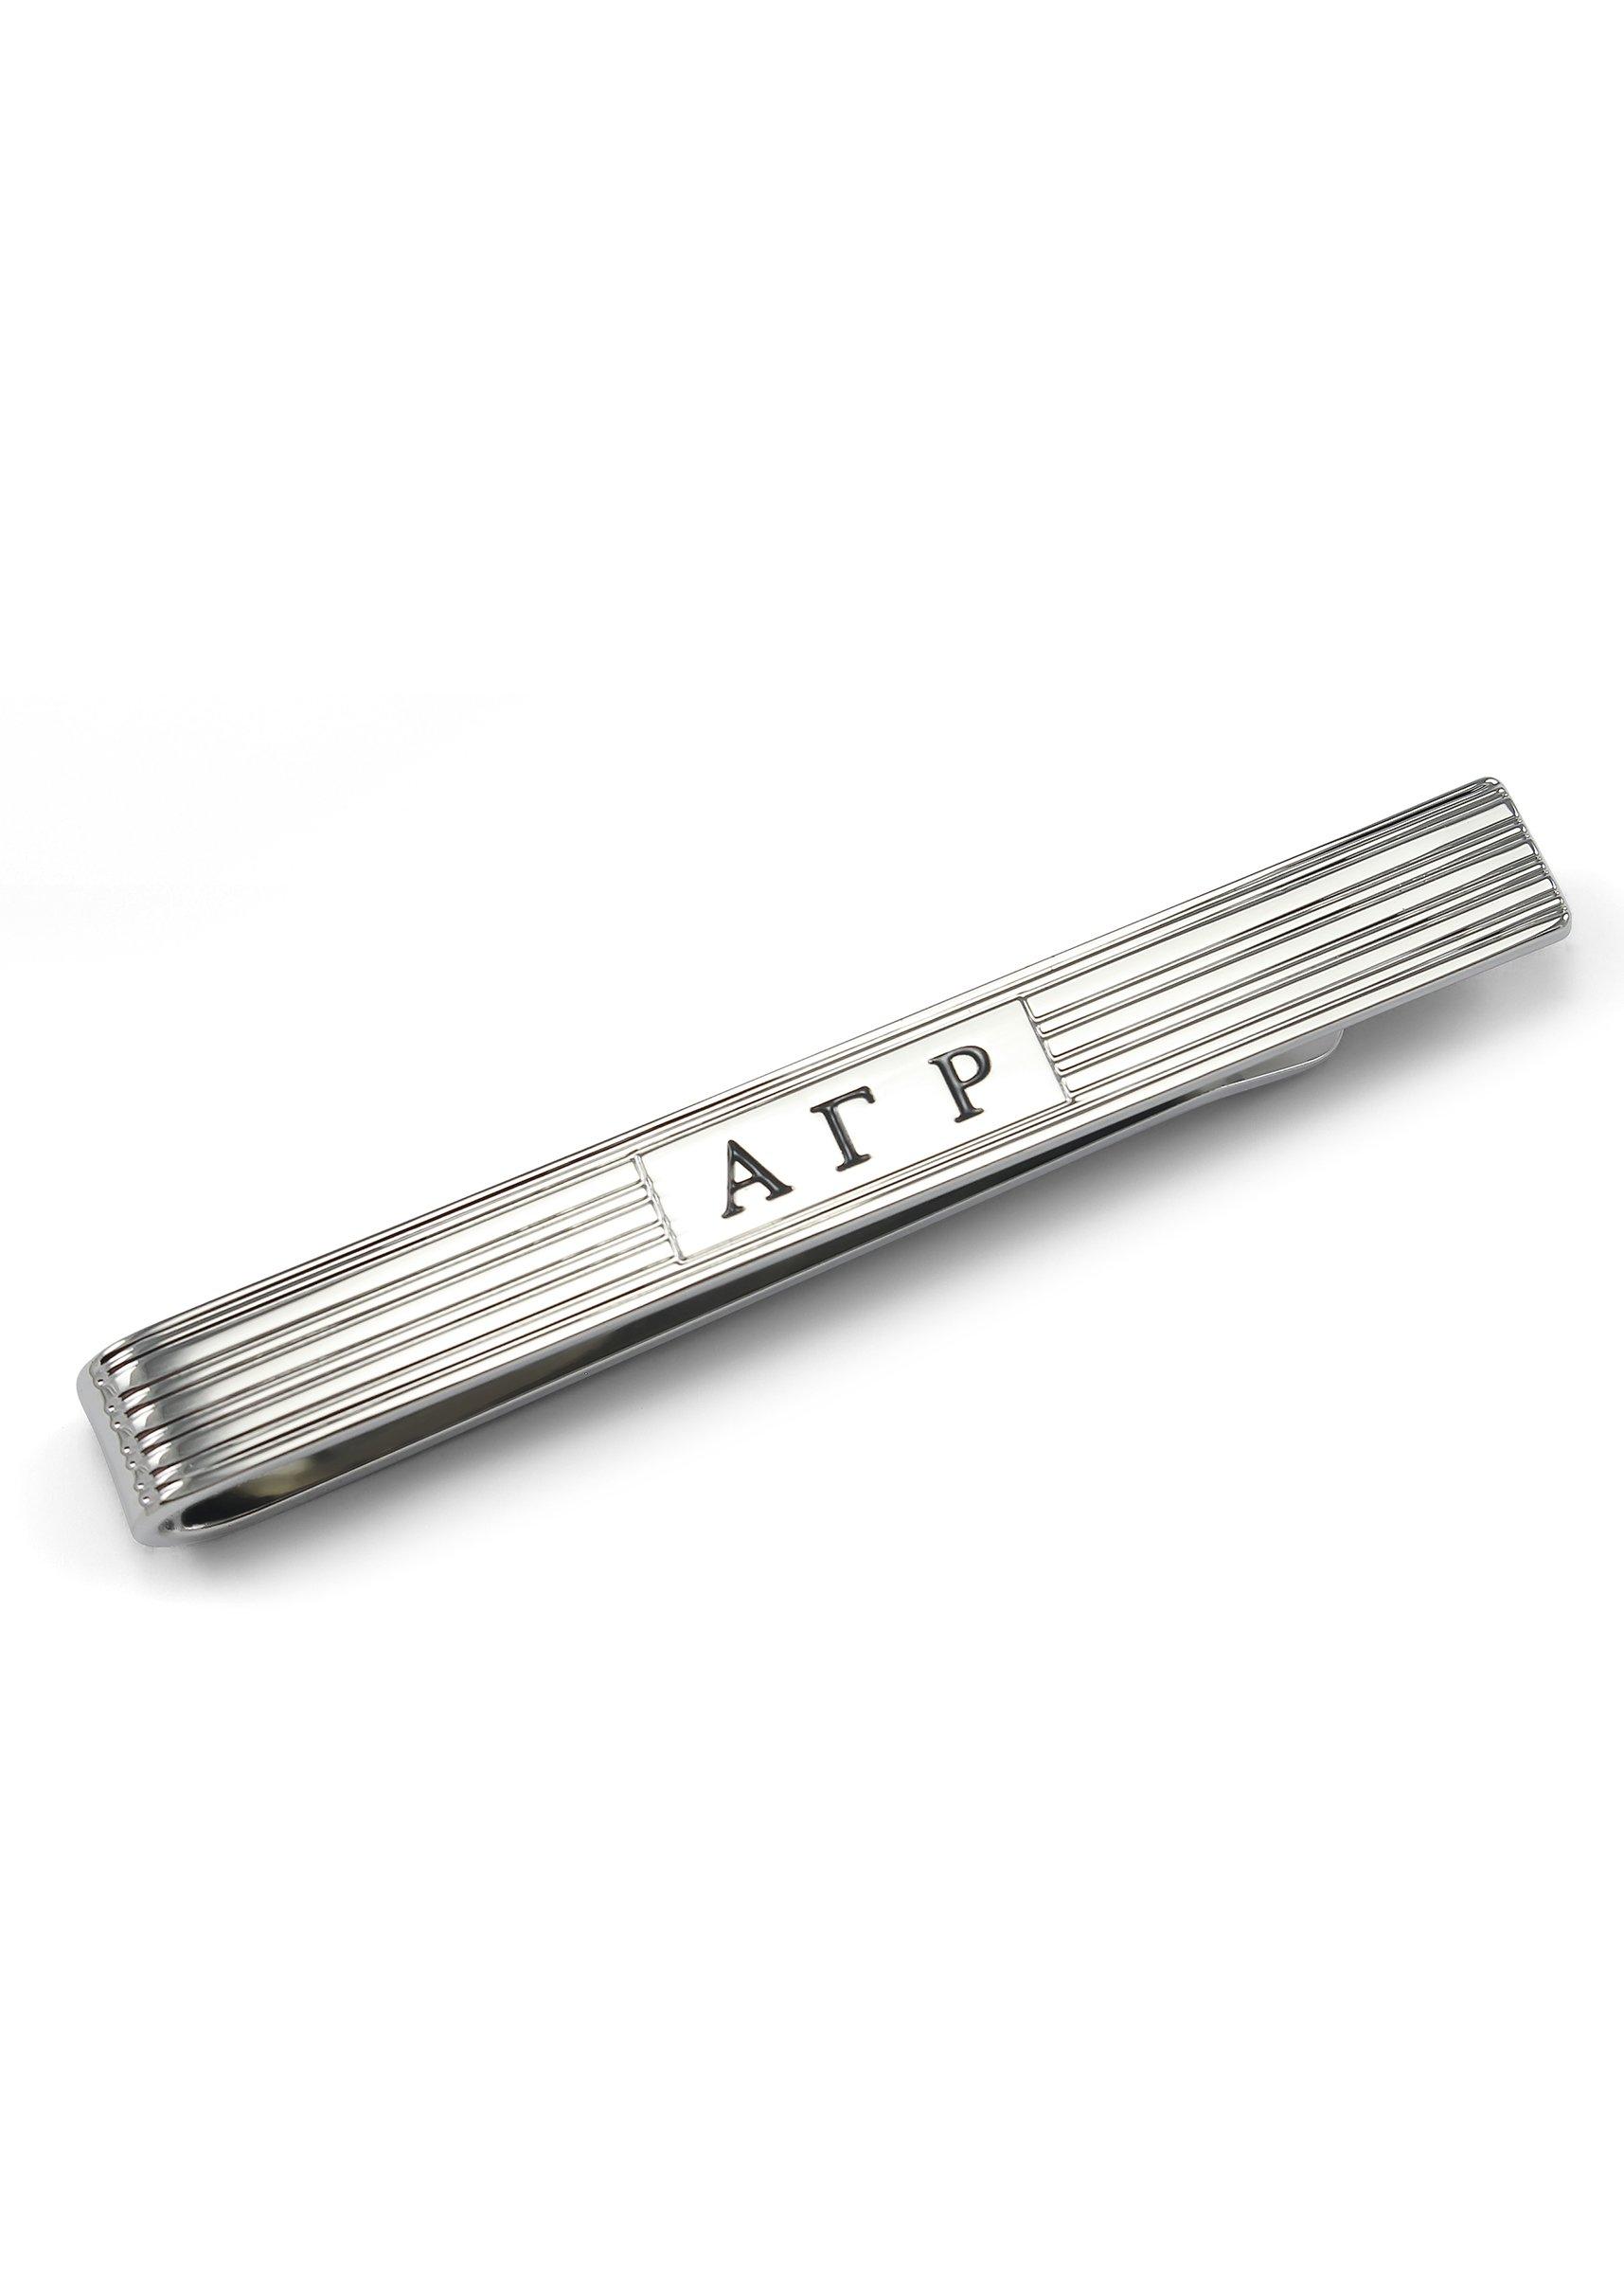 41e73421ee58 Cheap Alpha Kappa Rho Fraternity, find Alpha Kappa Rho Fraternity ...